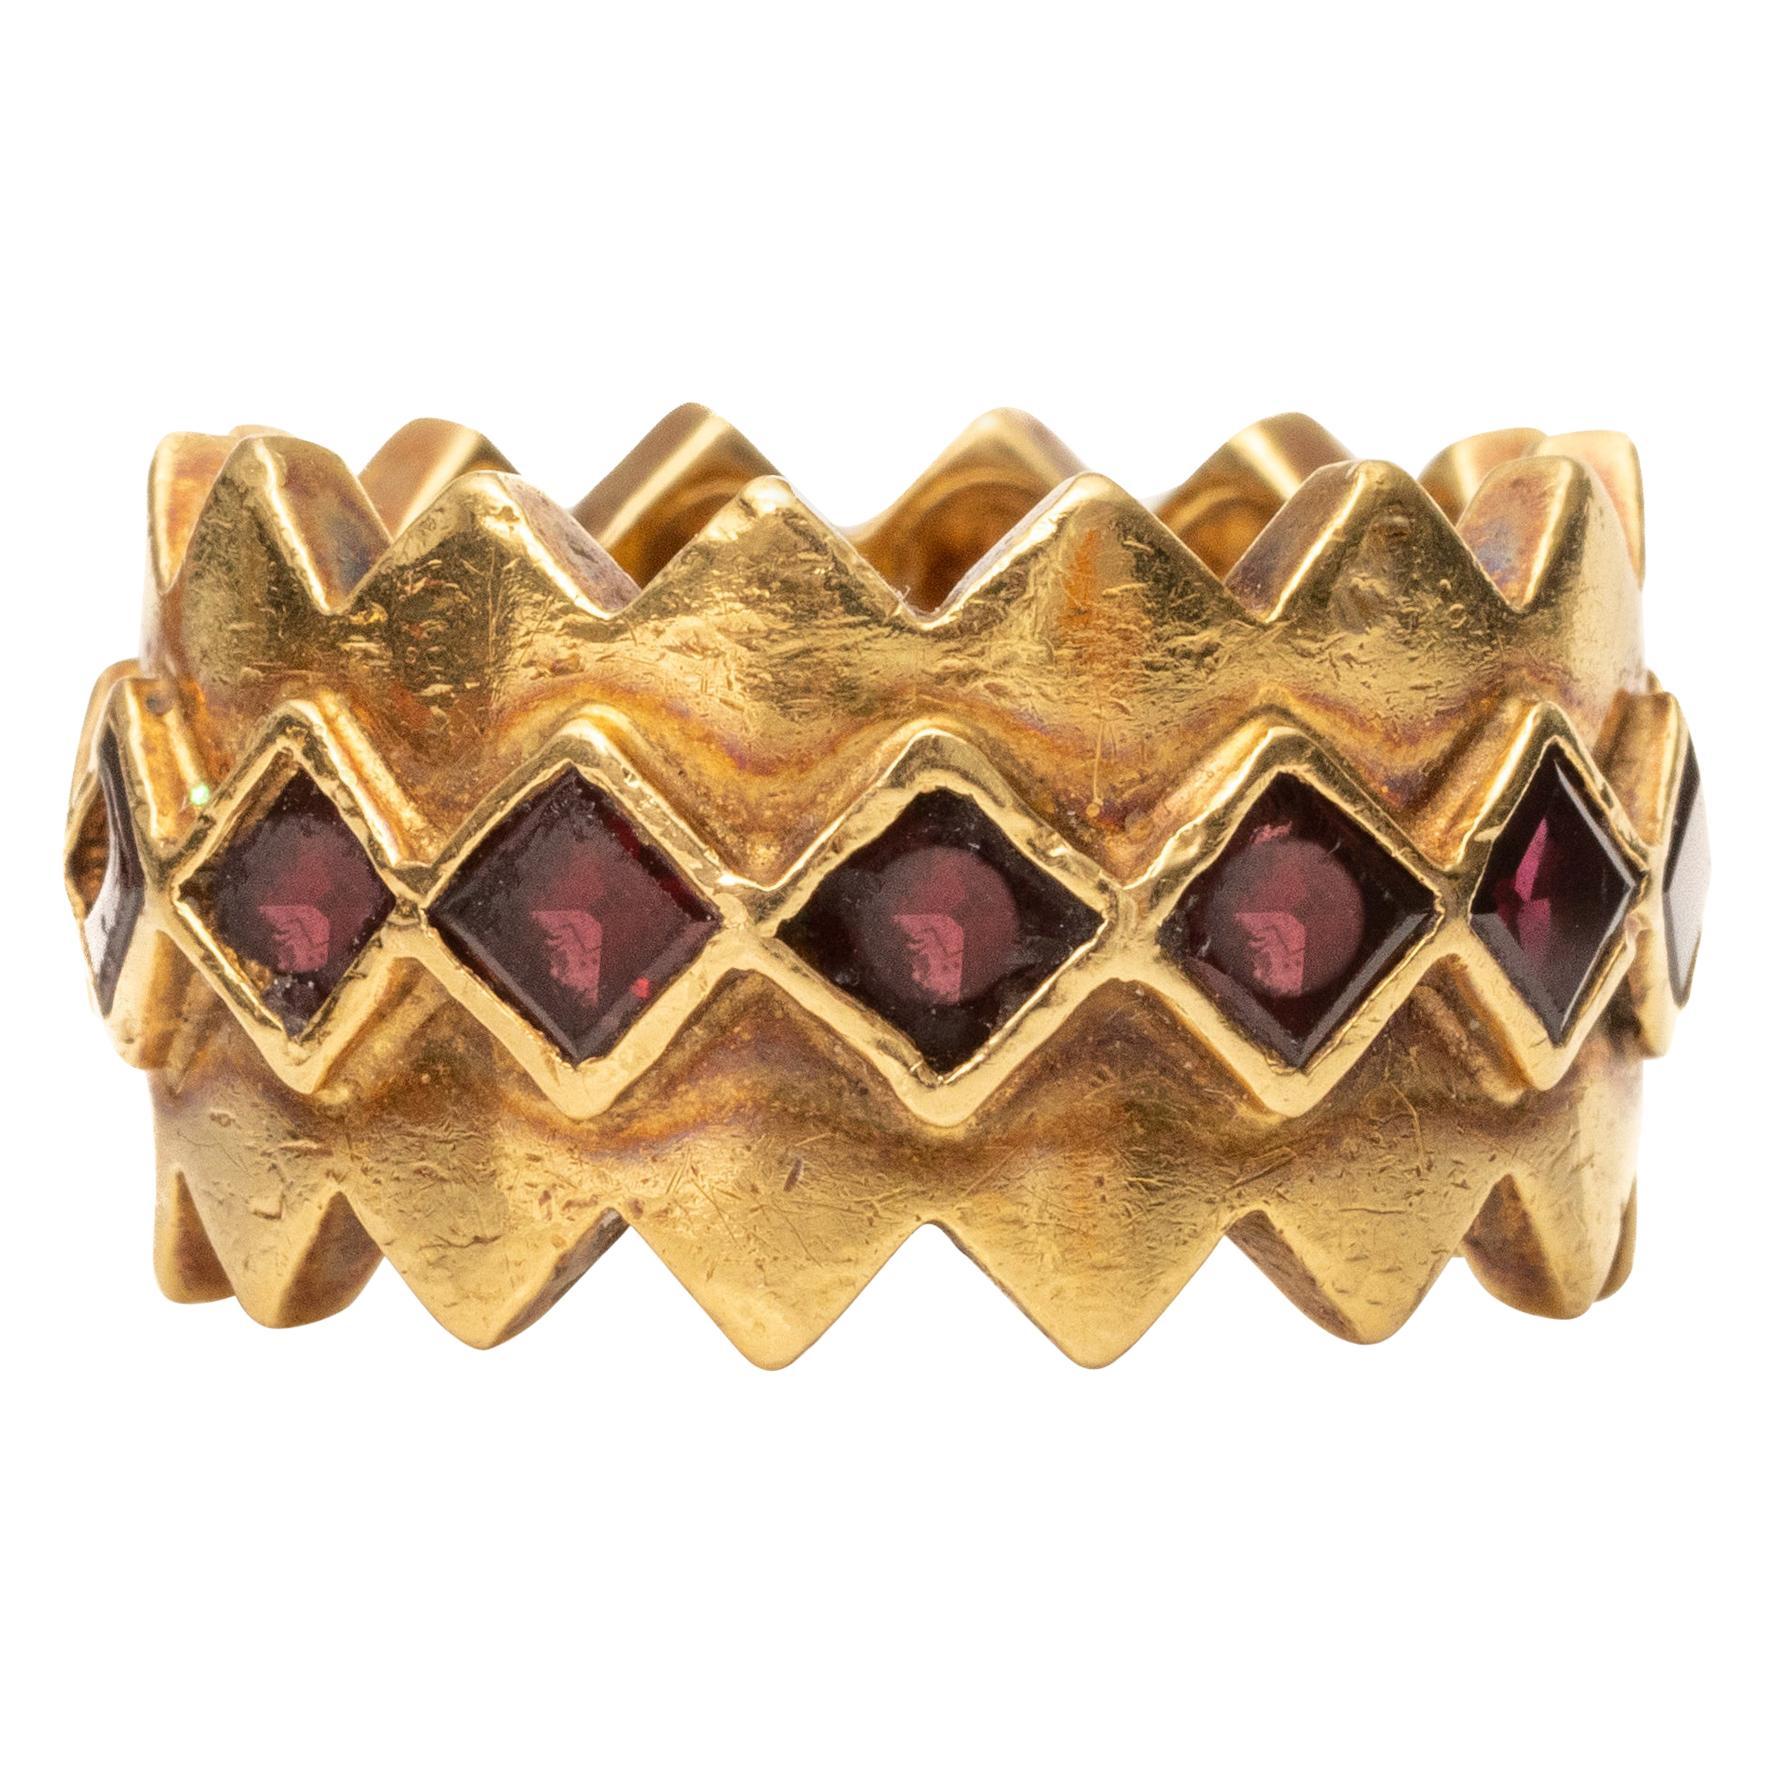 Tiffany & Co. Garnet Finger Trap Ring Band, 18 Karat Gold